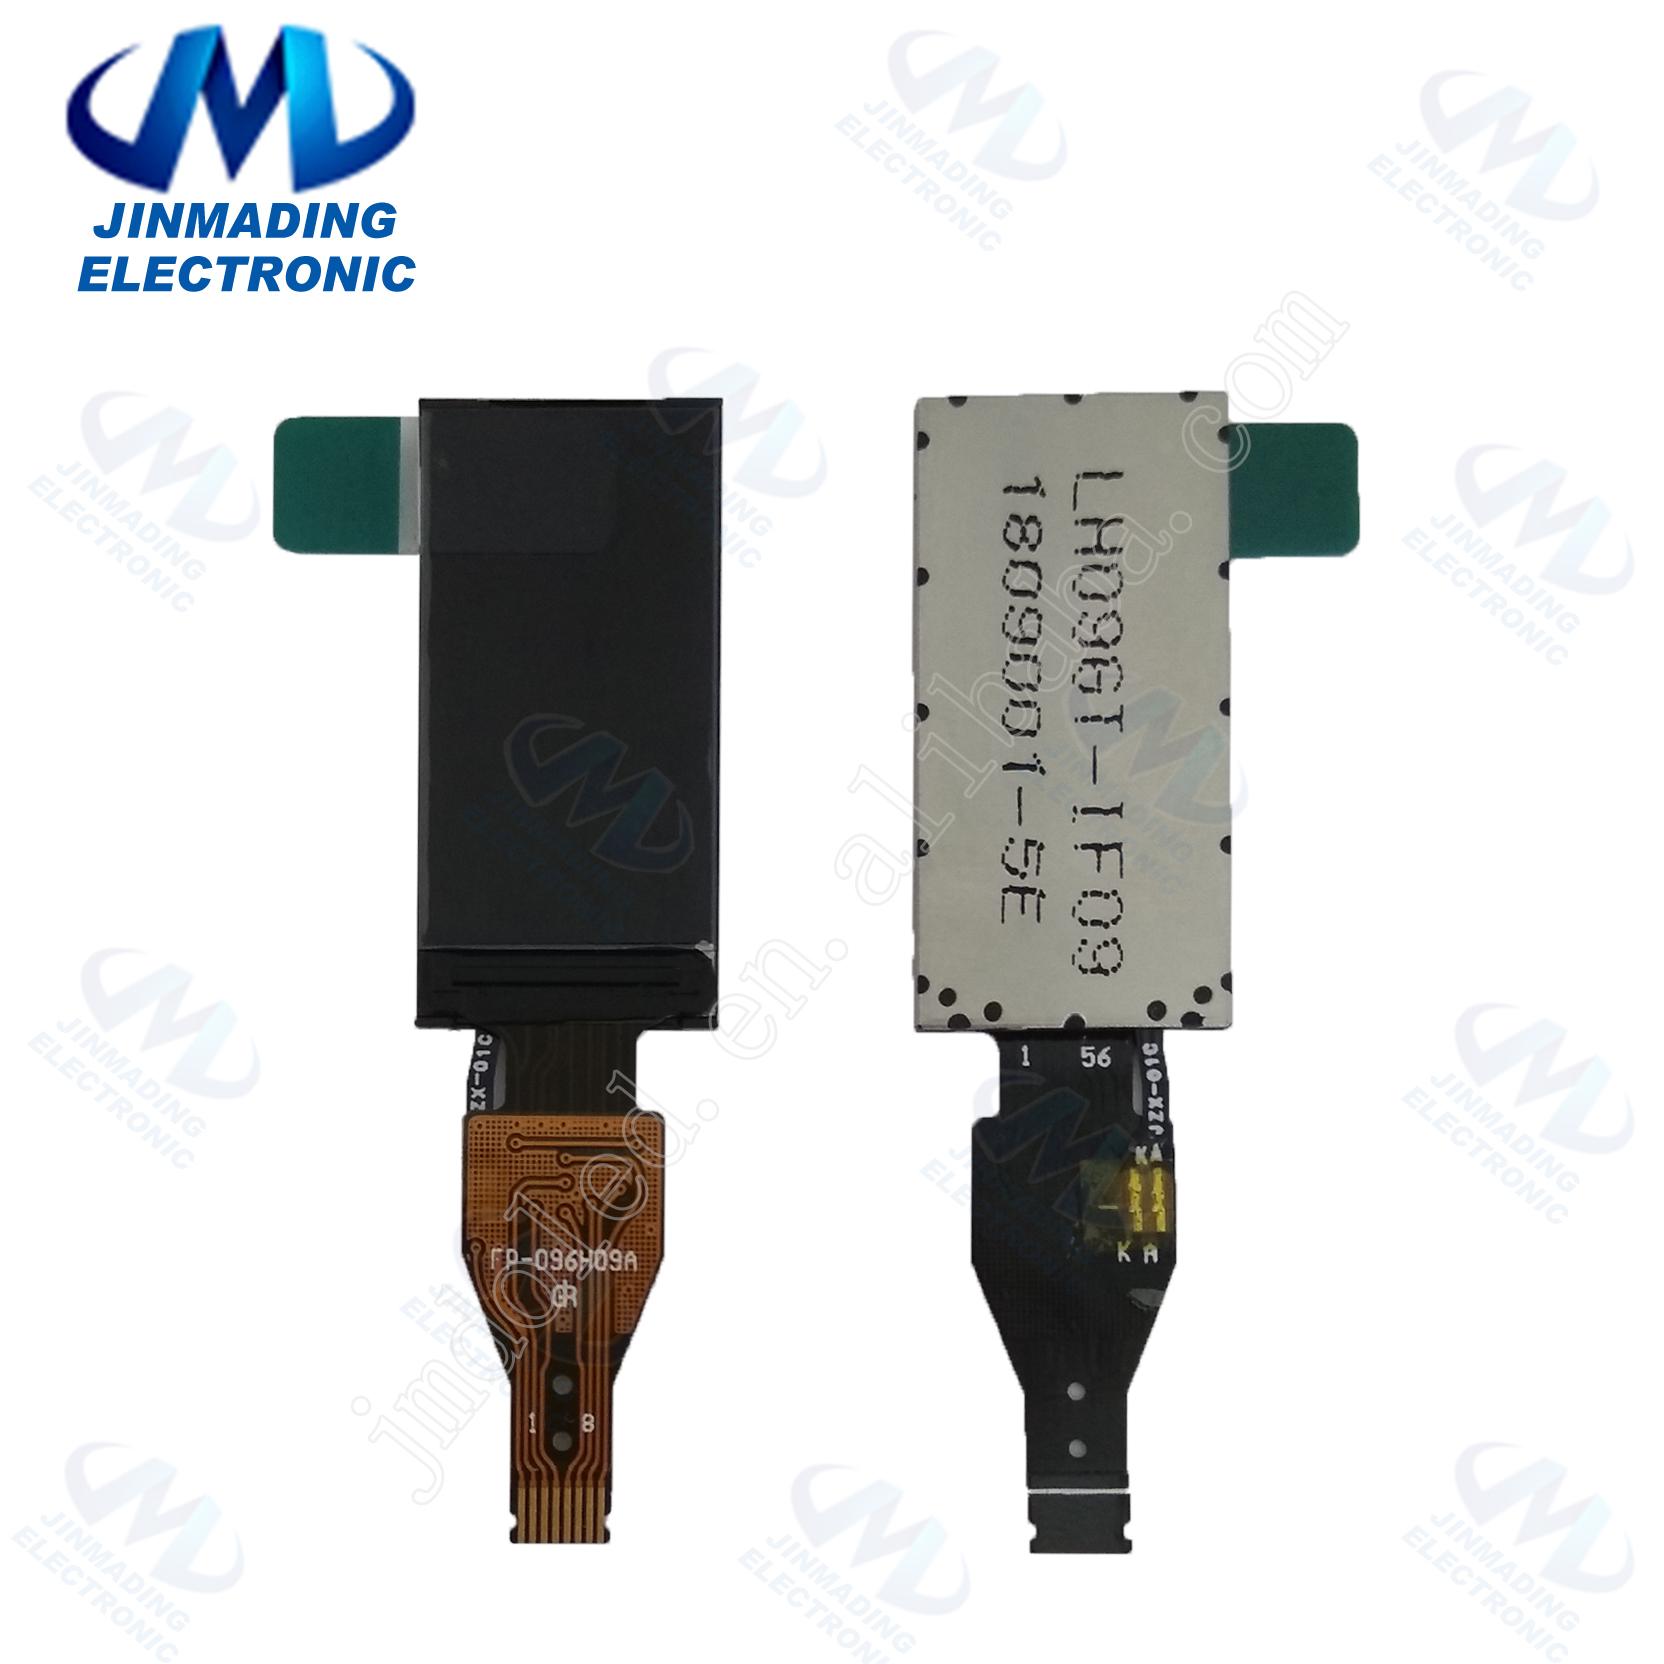 Jmd 0 96-inch Tft Hd Ips Lcd Display 80*160 Resolution Plug In 8pin Drive  Ic St7735 - Buy 0 96 Inch Tft,Tft Hd Ips Lcd Display,0 96 Inch Tft Hd Ips